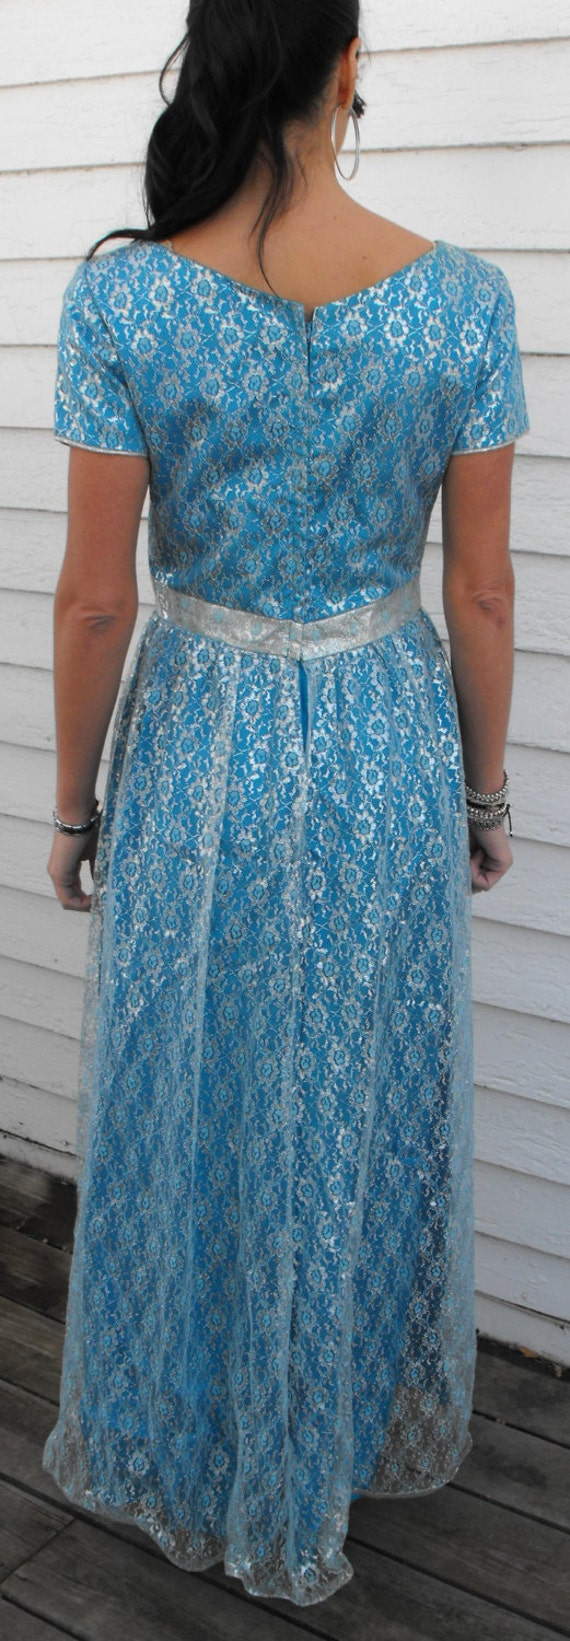 Emma Domb Blue Silver Lace Gown Vintage 60s Party Dress 1960s